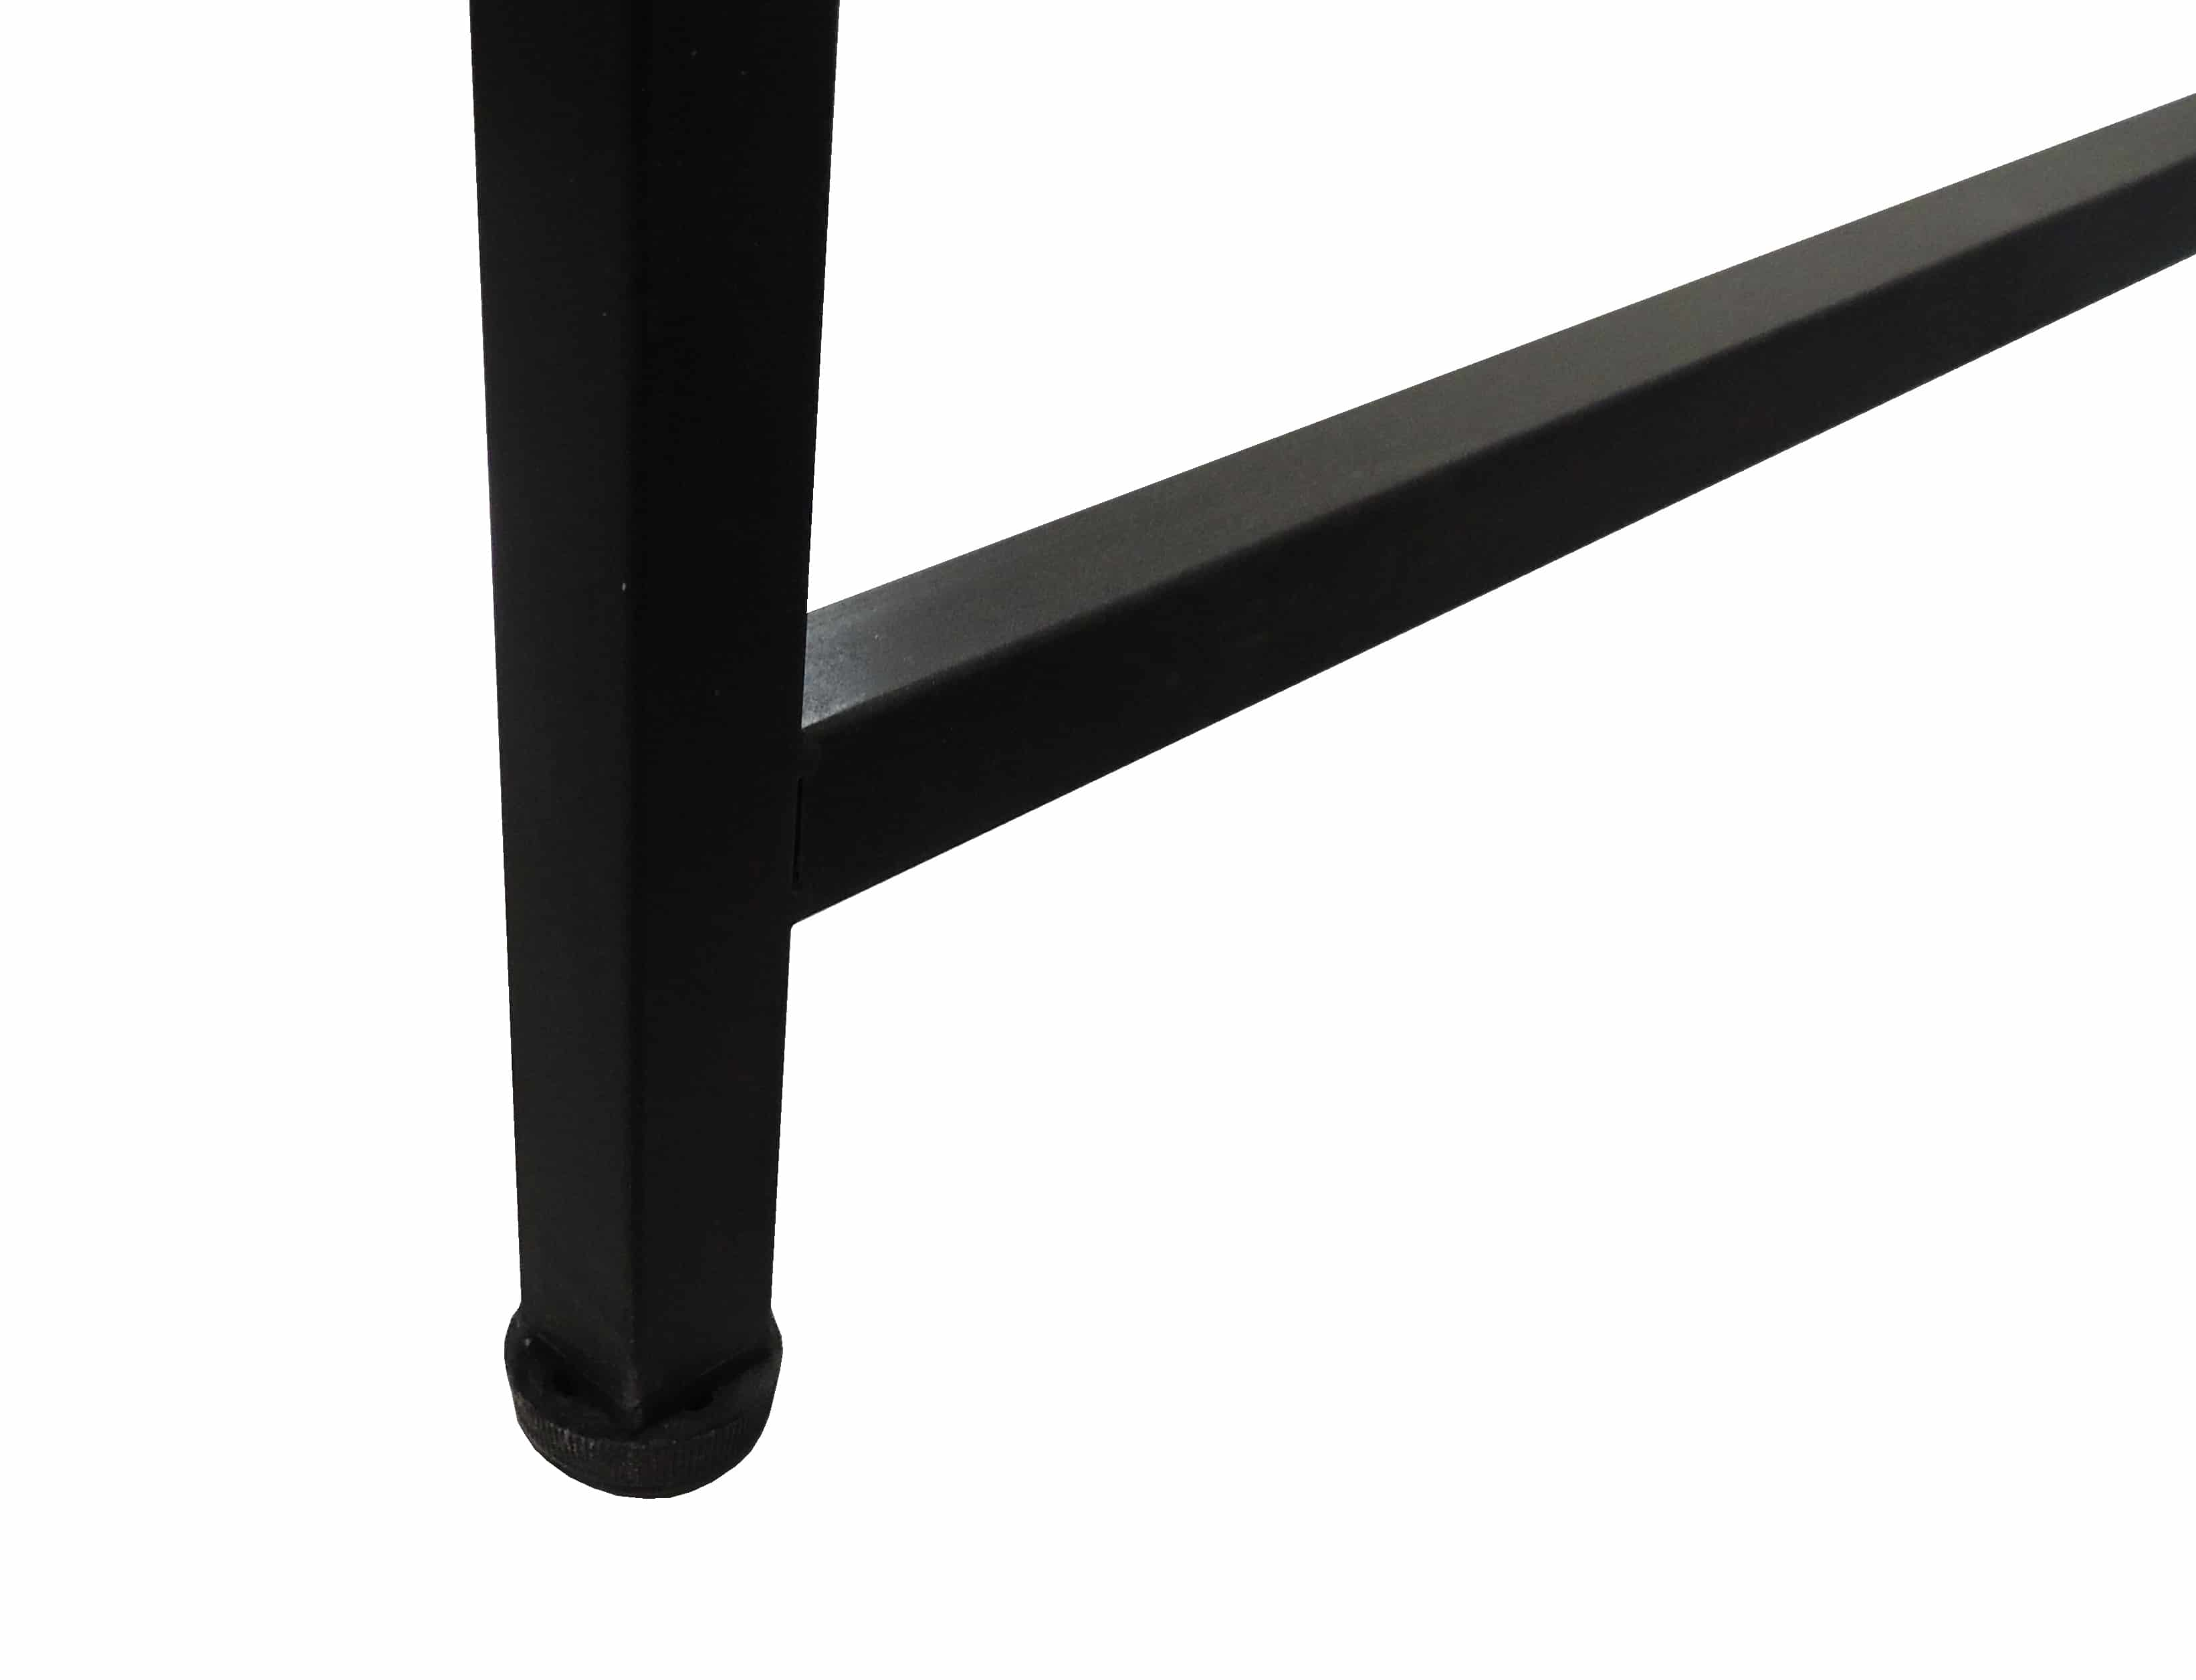 4livingz Retro industrieel Bureau 120x60x75 cm - zwart/bruin